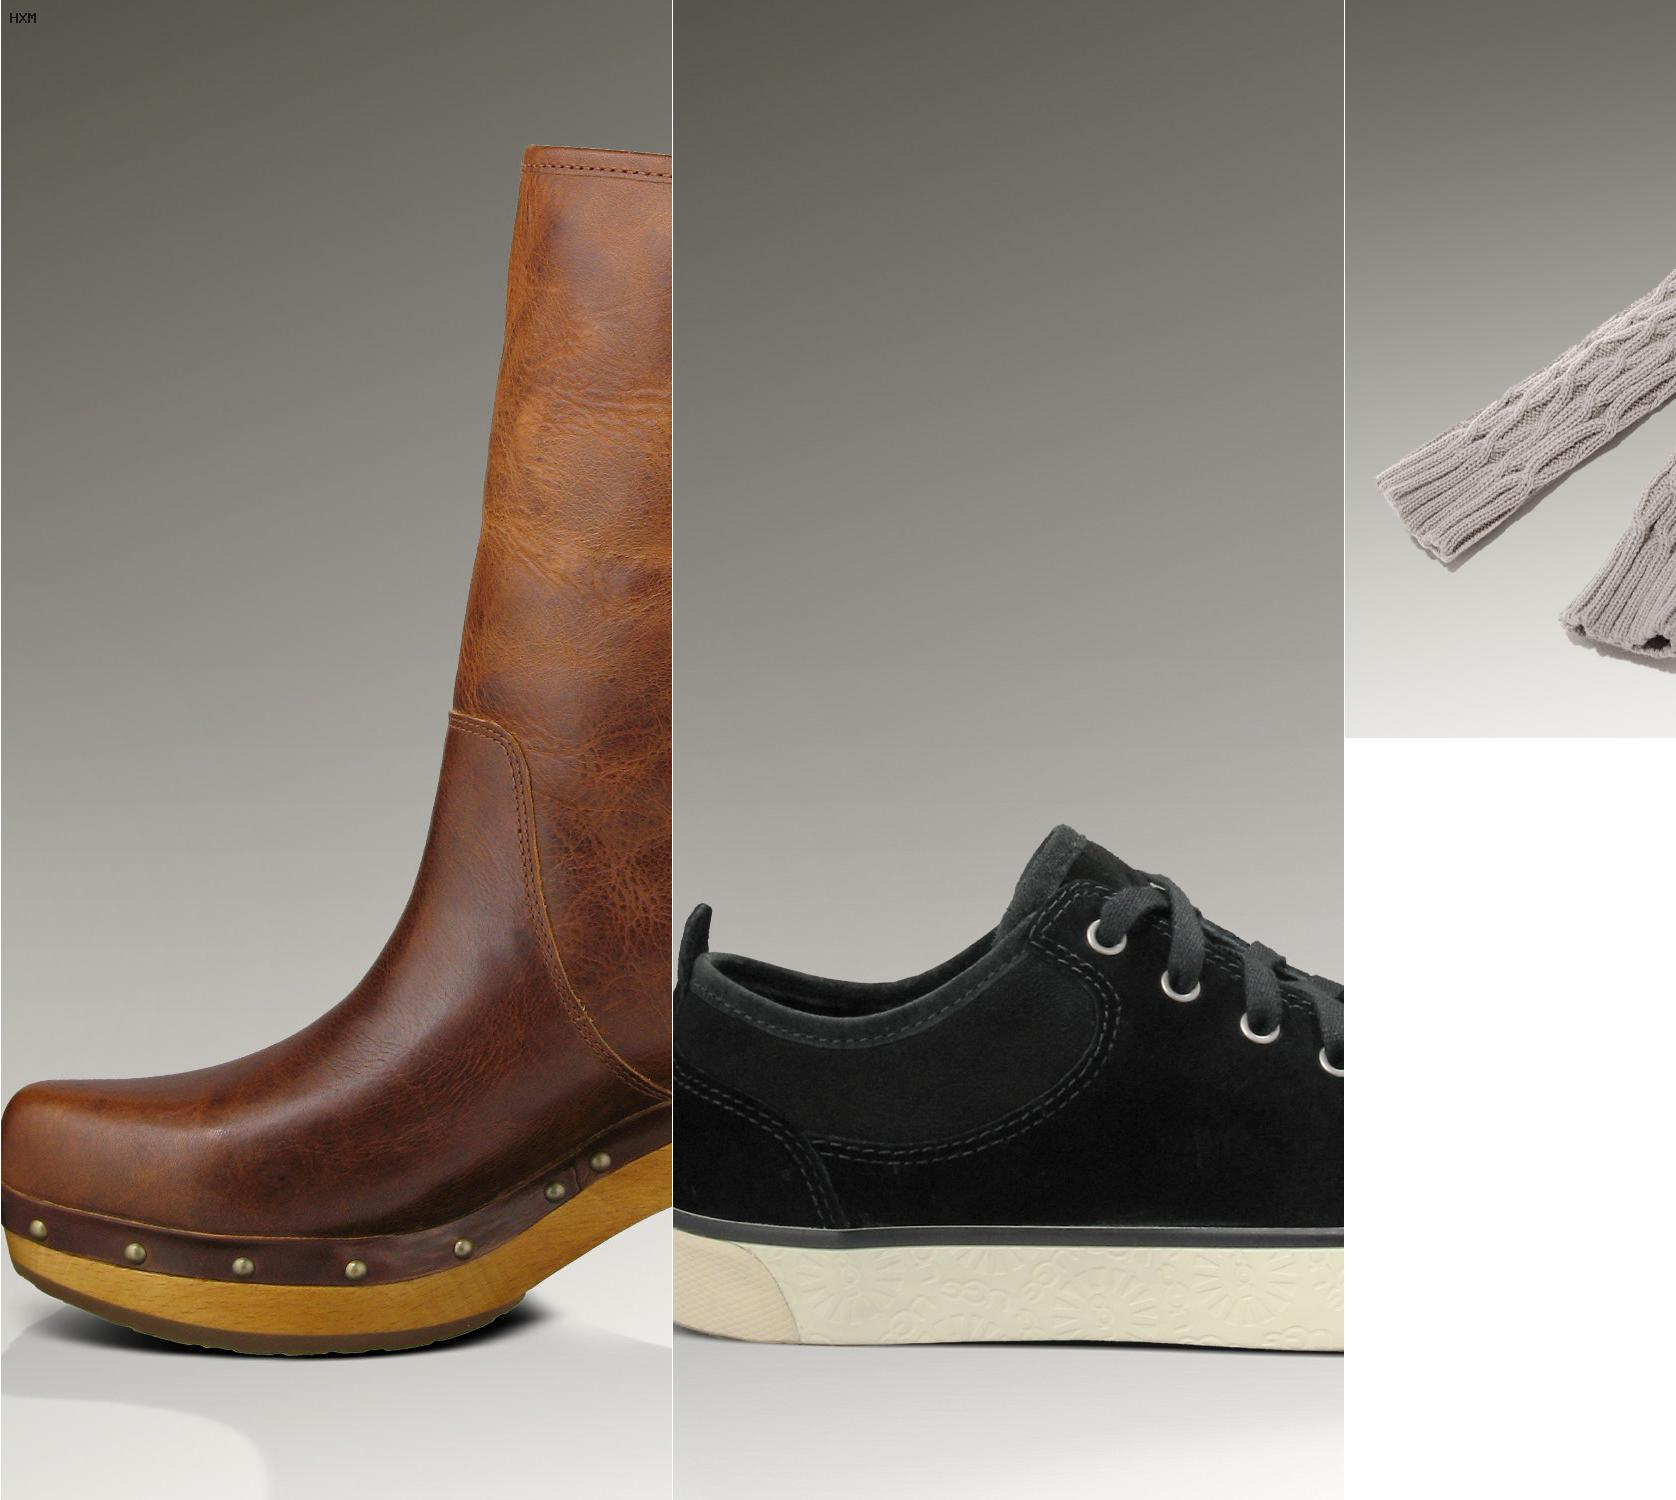 mou boots o ugg